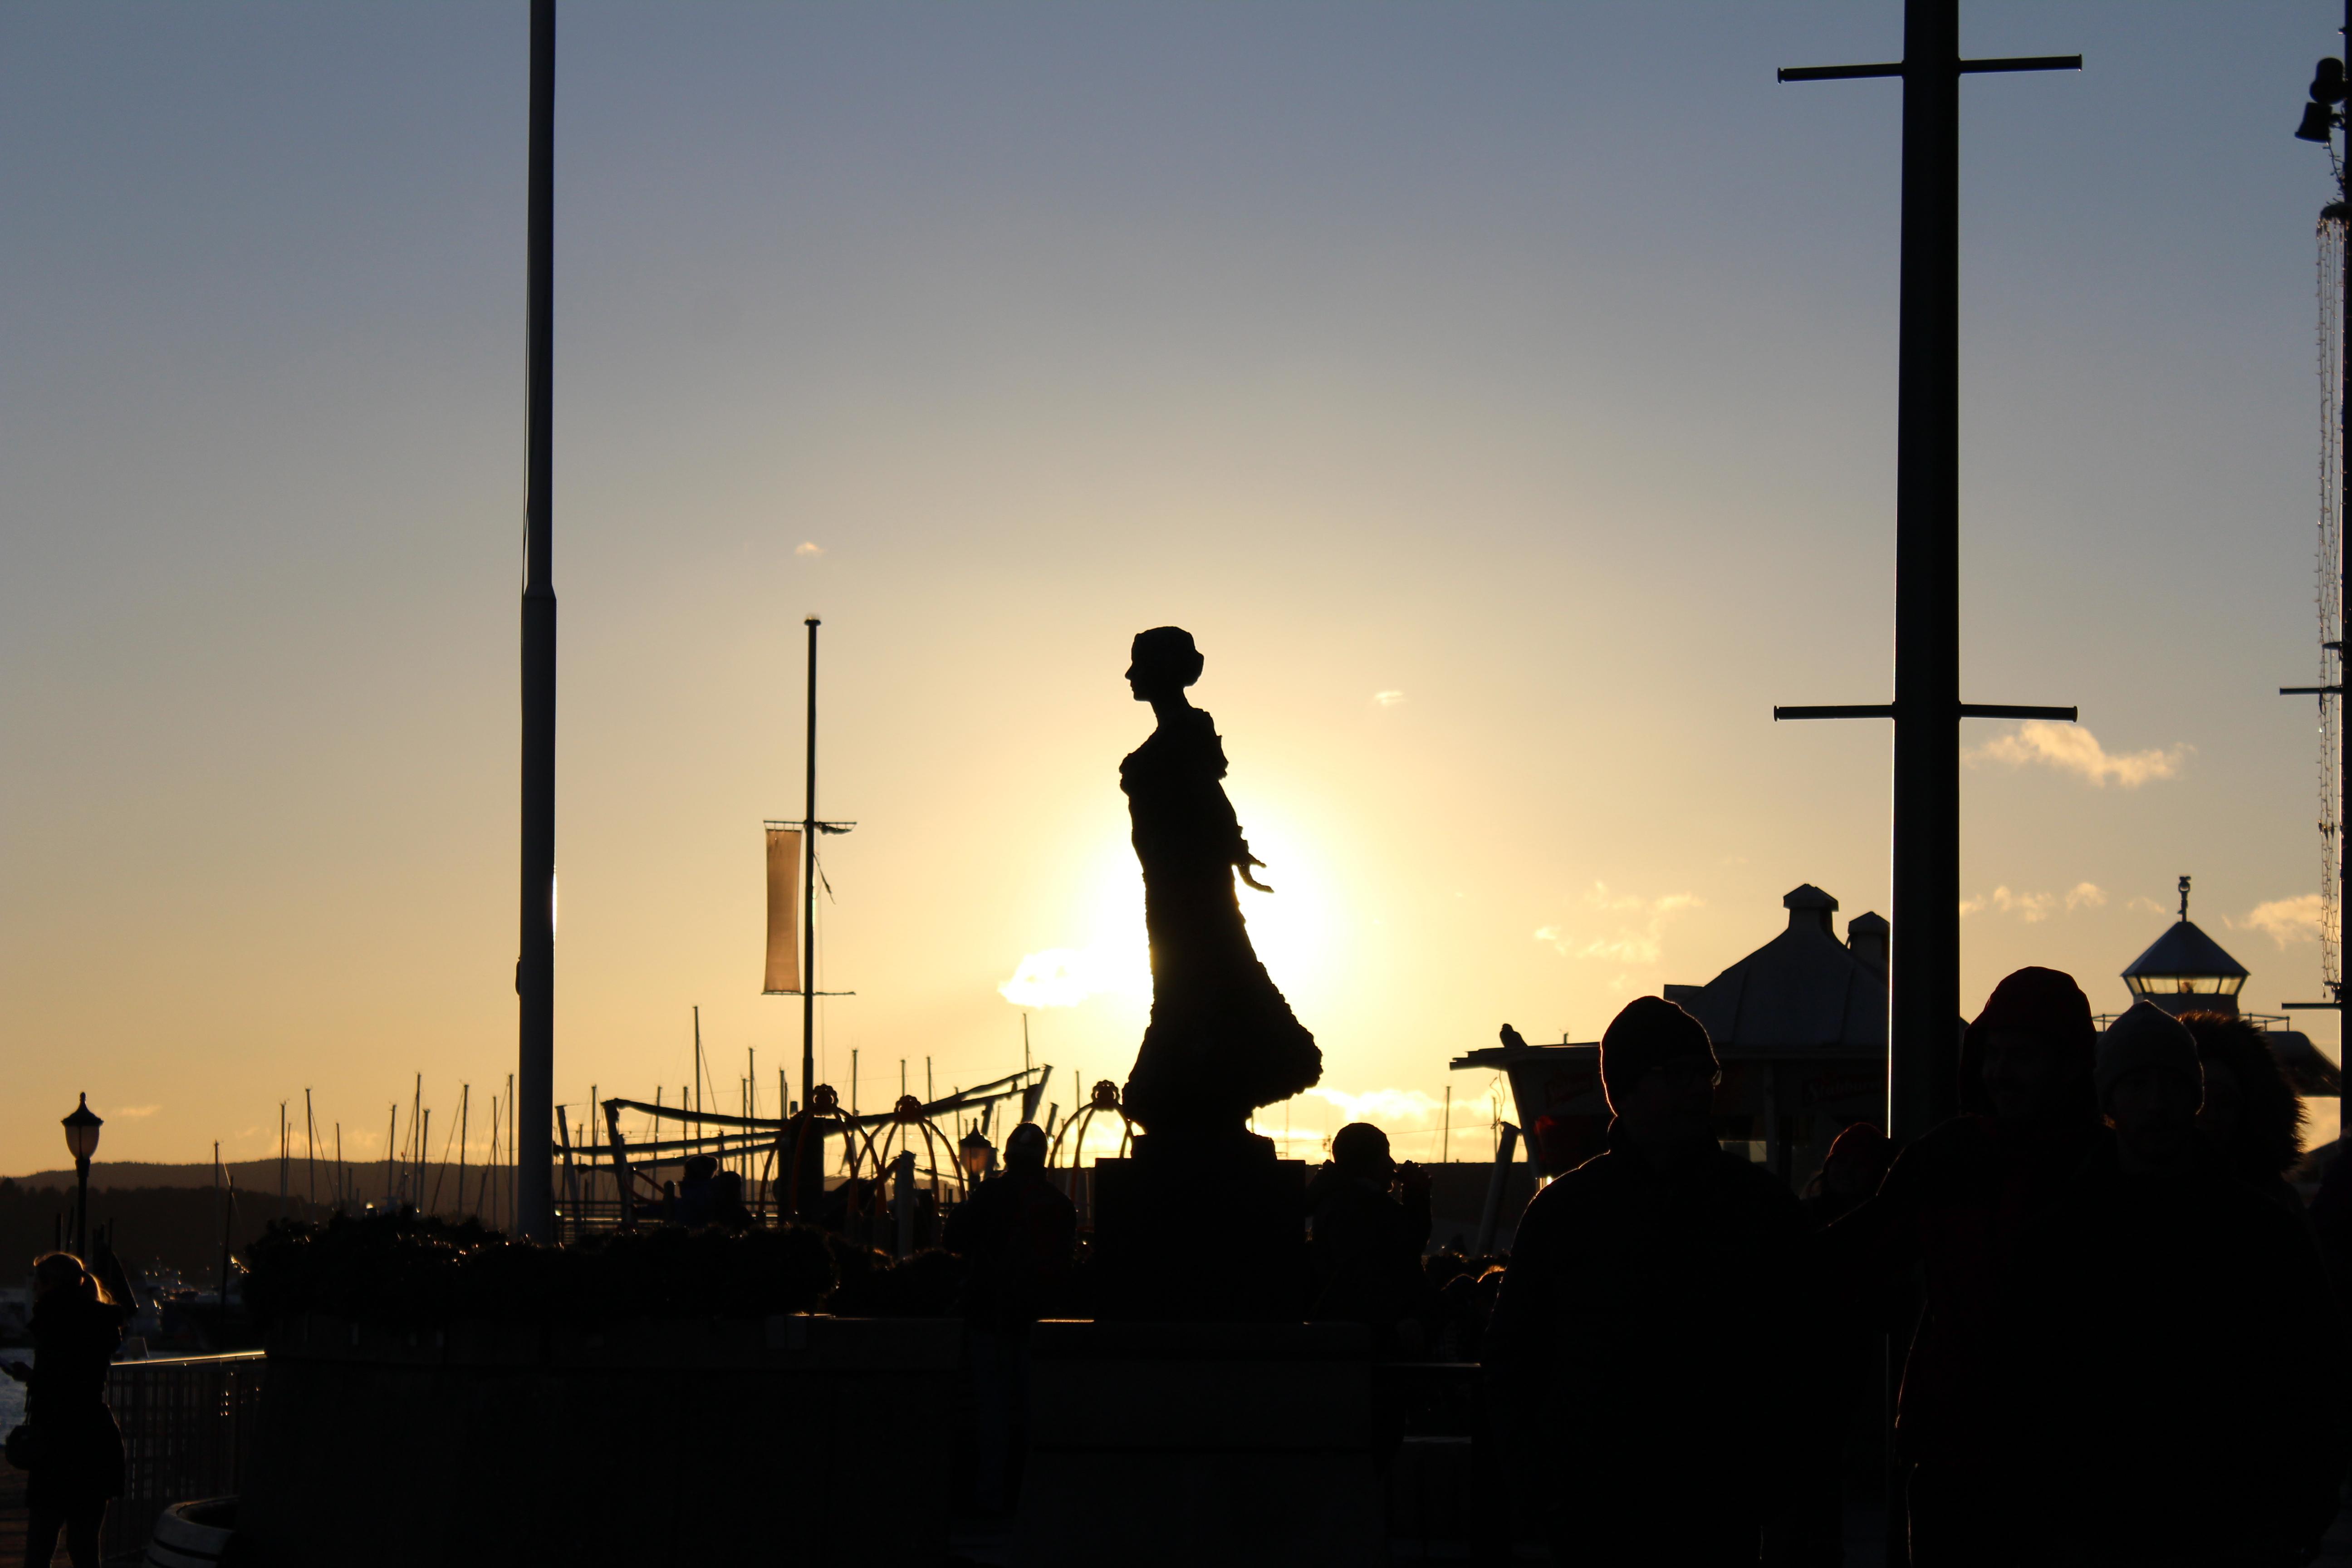 coucher de soleil statue oslo norvège